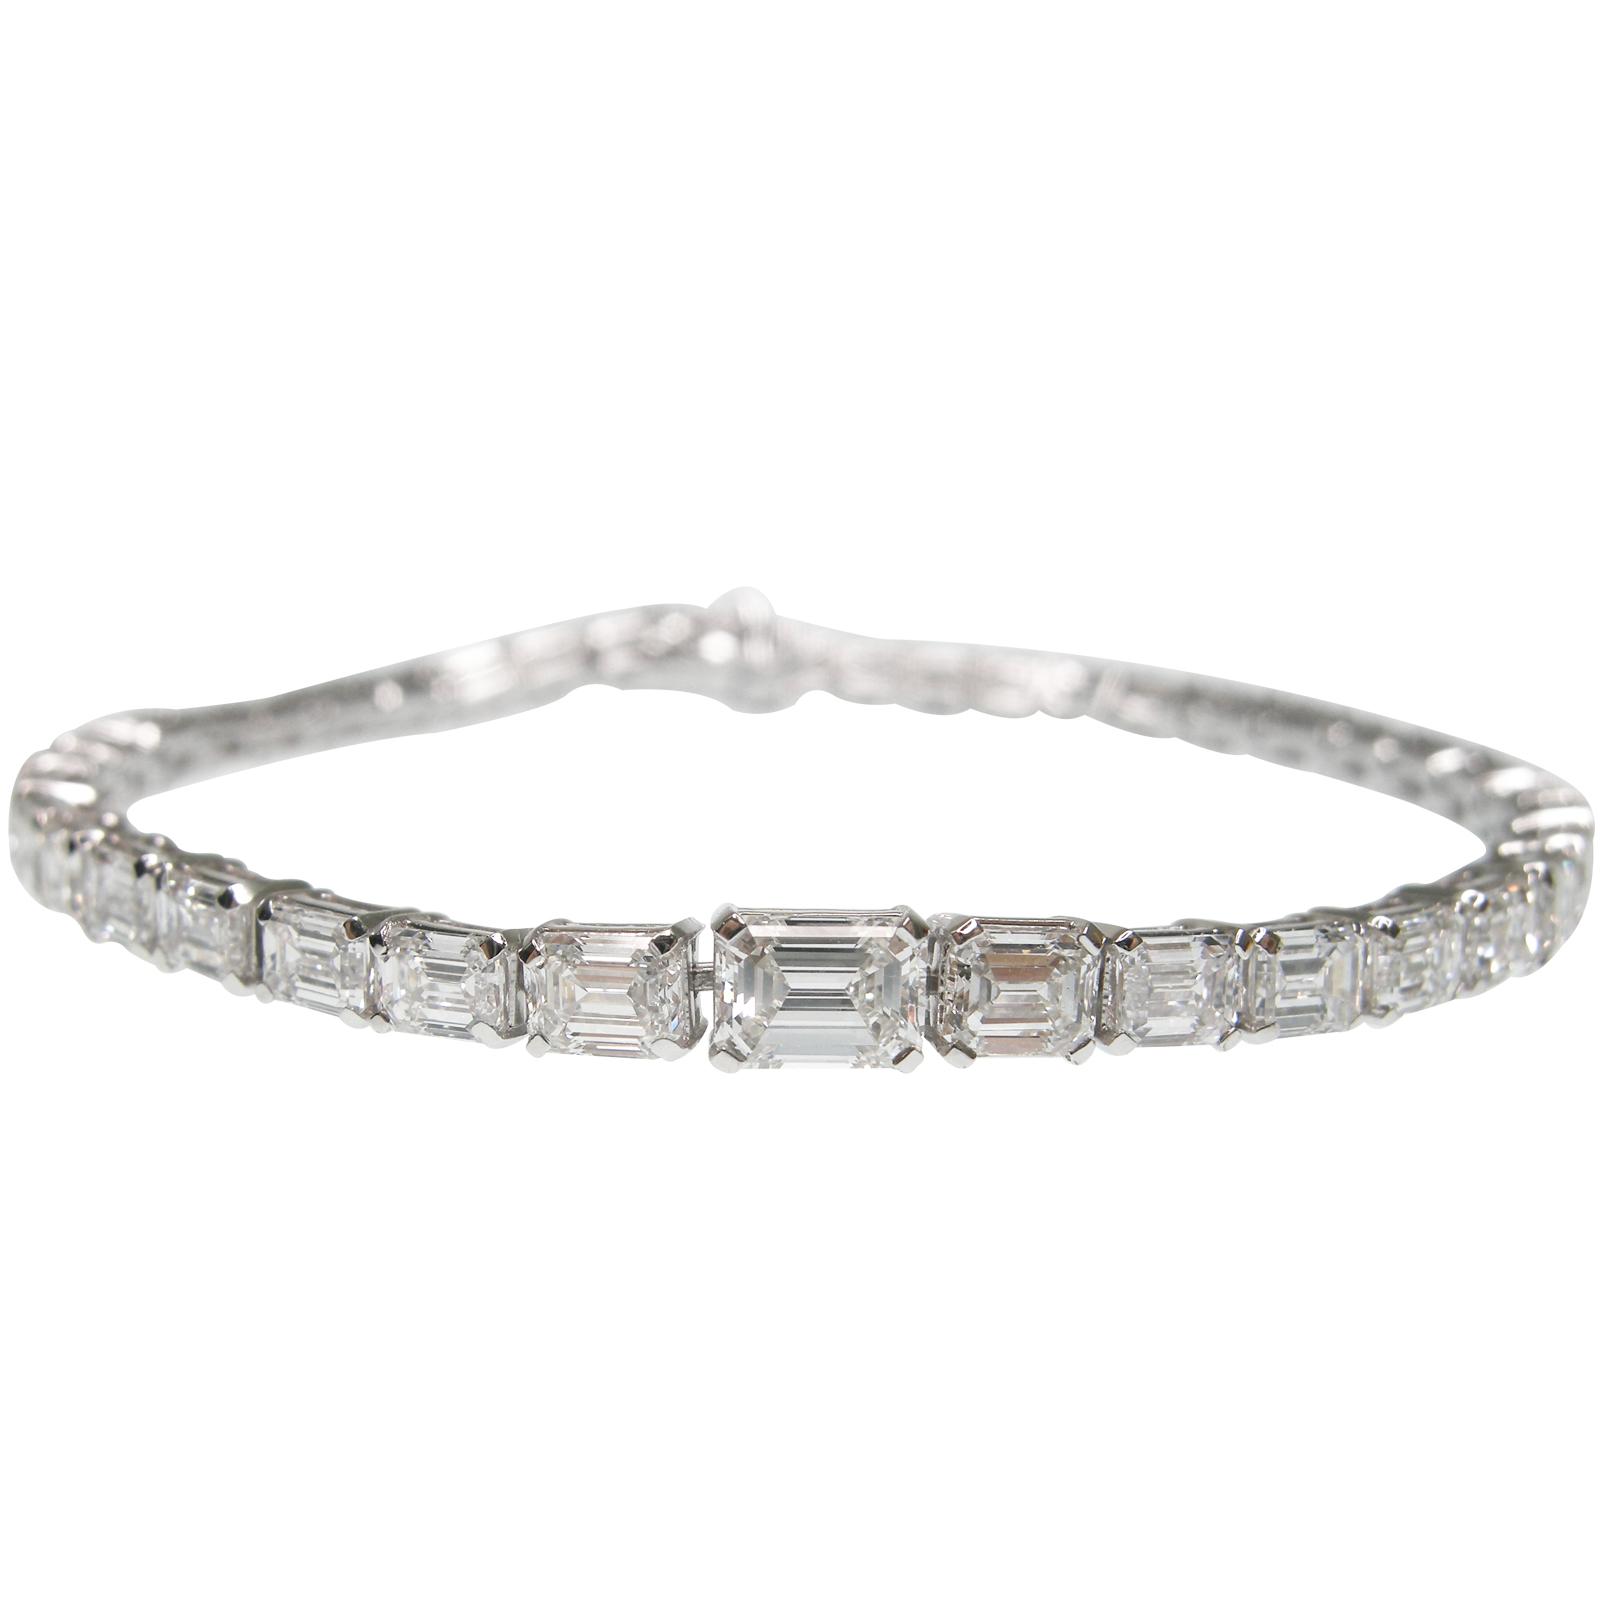 GRADUATED EMERALD CUT DIAMOND TENNIS BRACELET CLUSTER DIAMOND PENDANT BESPOKE FINE JEWELLERY BY SHAHINA HATTA